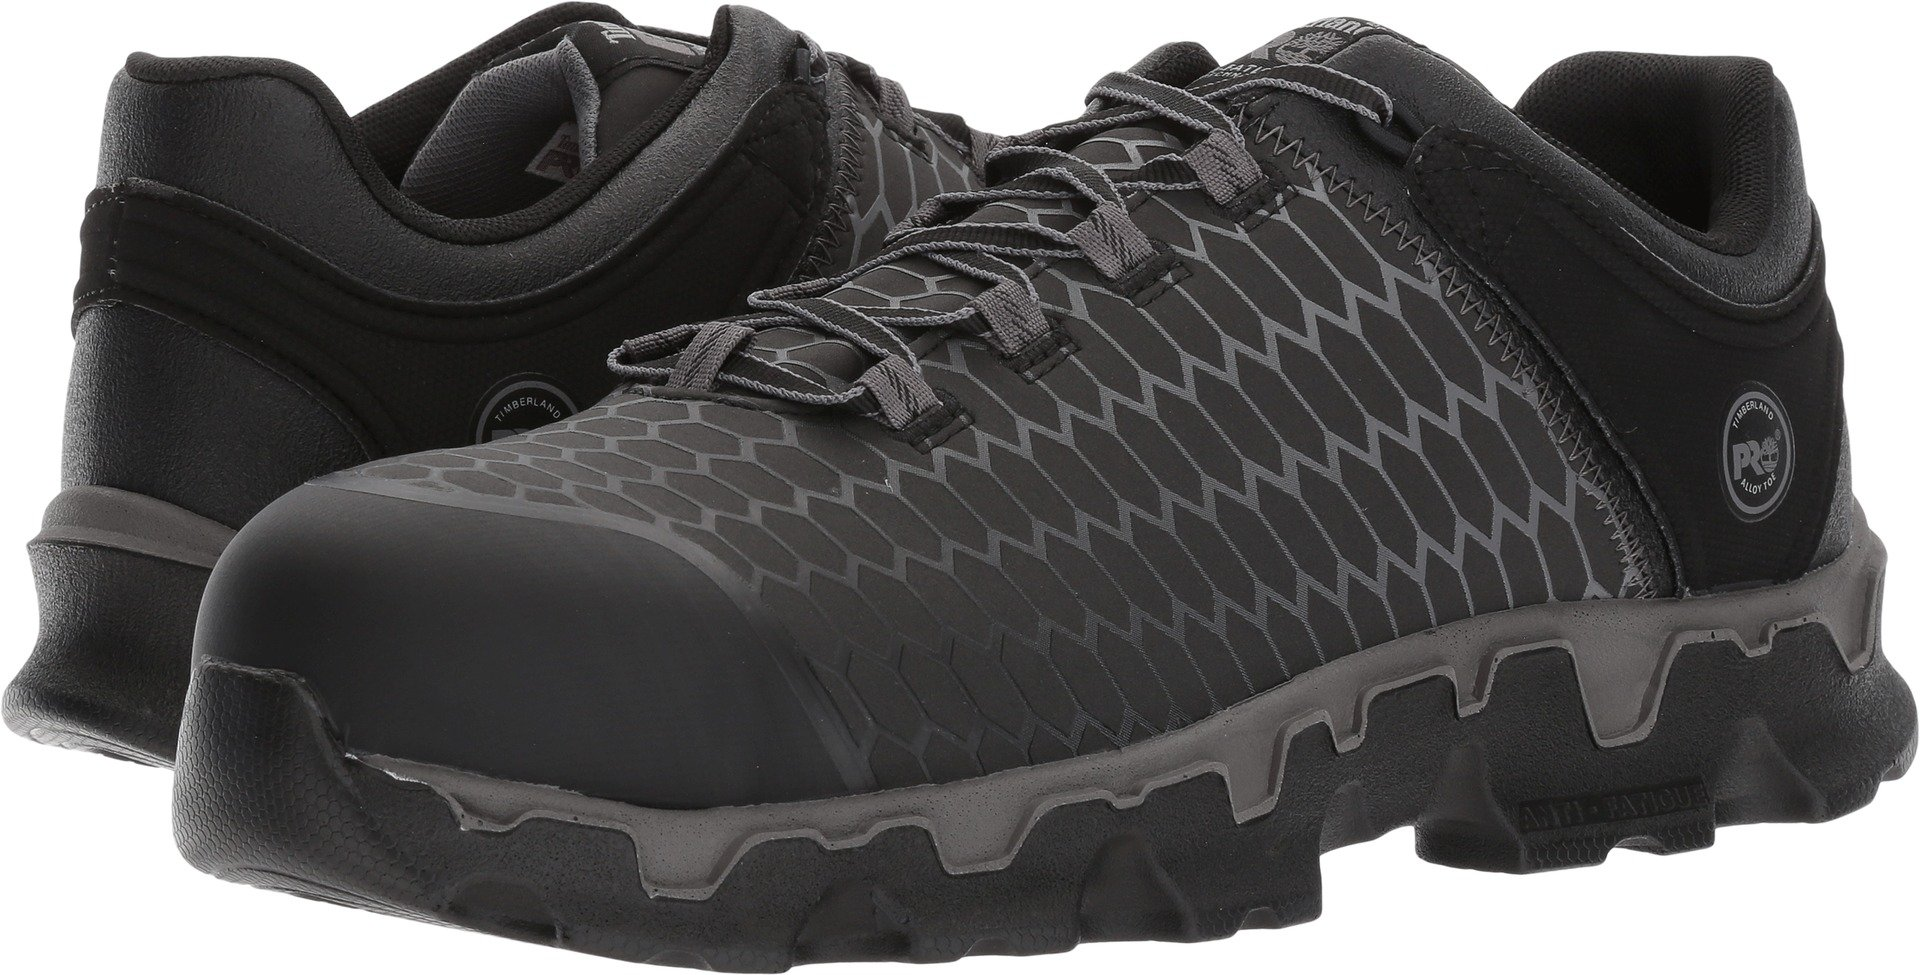 Timberland PRO Men's Powertrain Sport Raptek Alloy Toe EH Industrial and Construction Shoe, Black Raptek, 13 M US